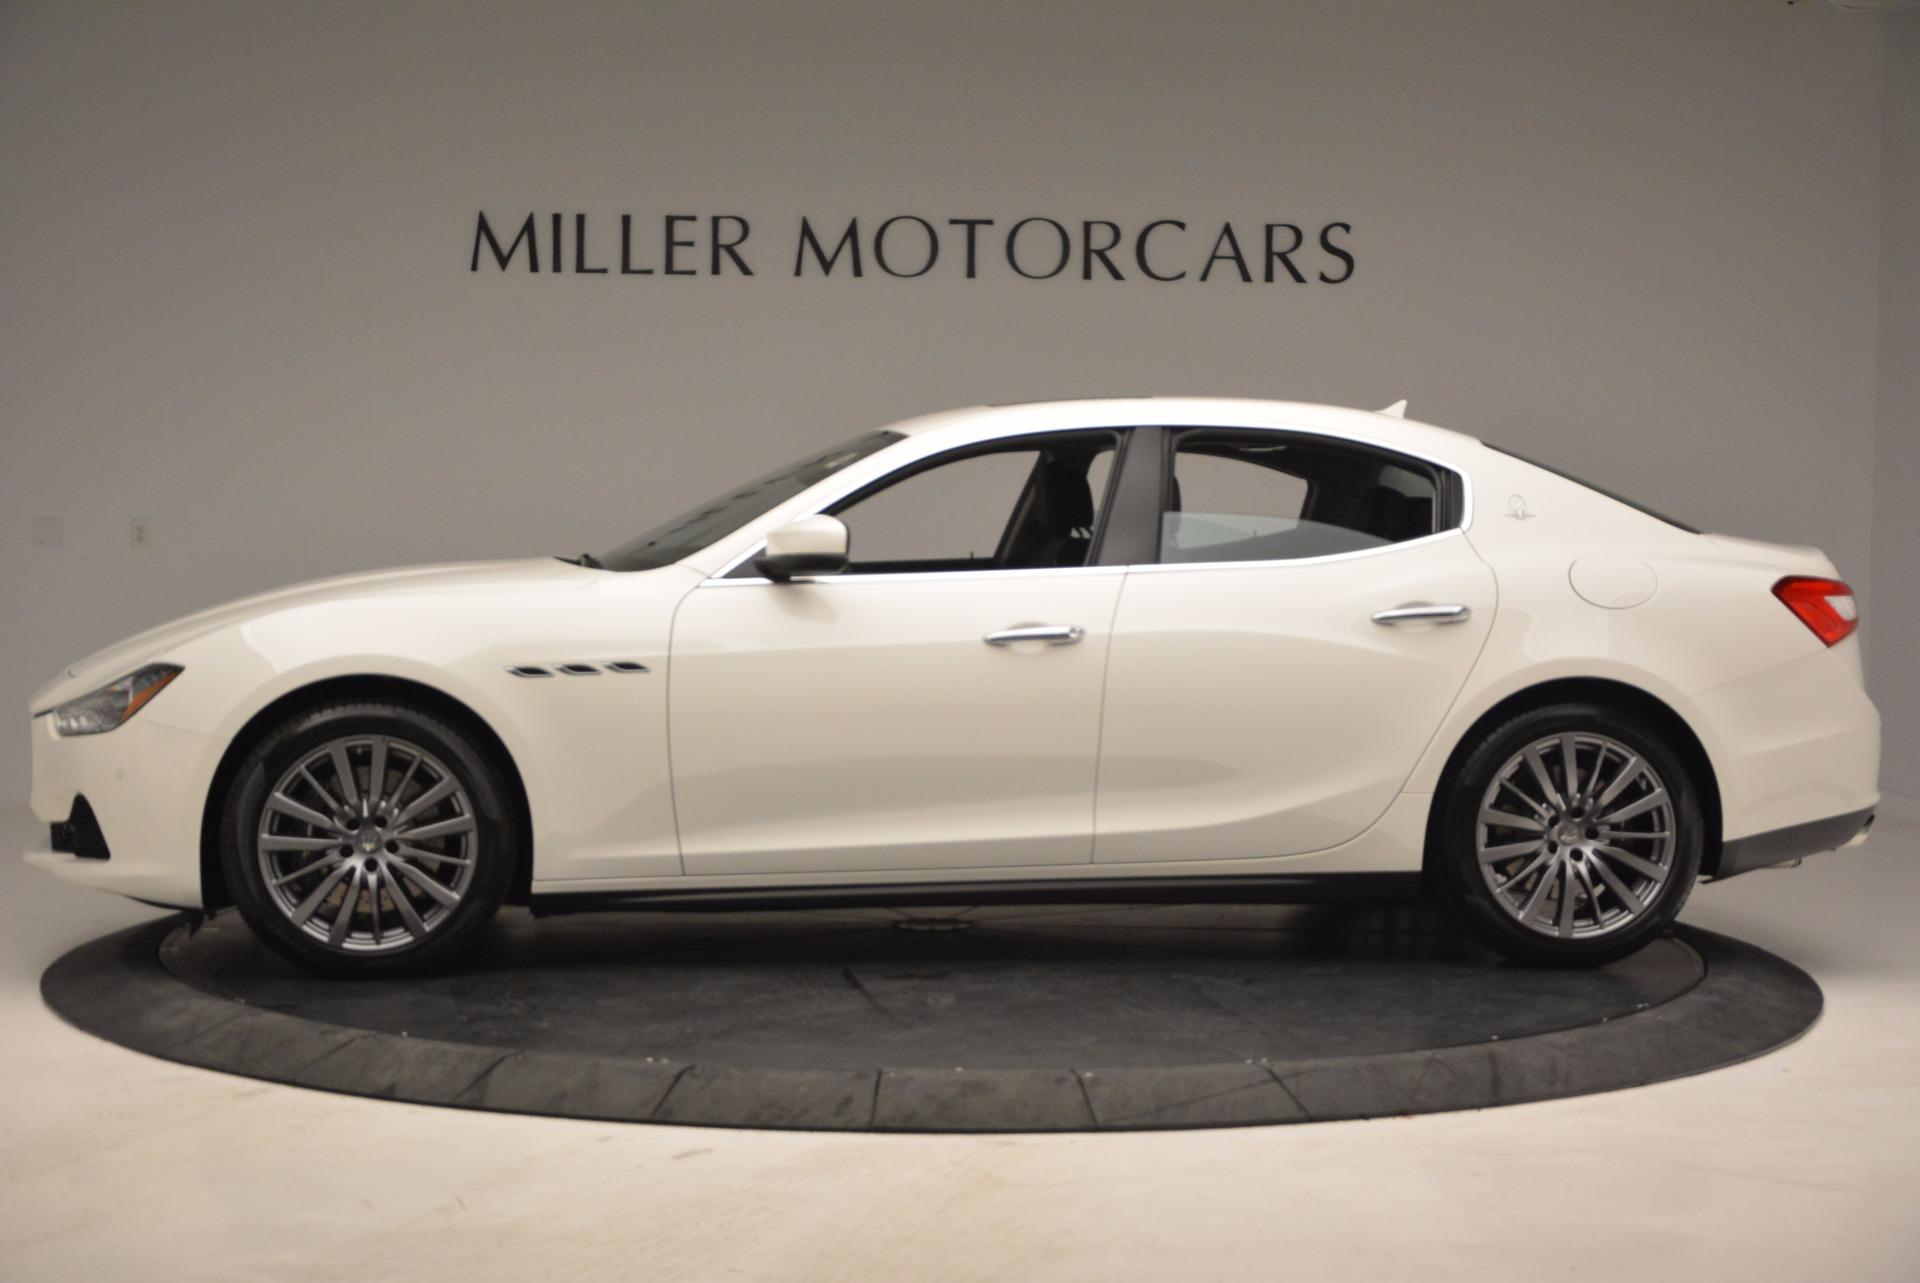 New 2017 Maserati Ghibli S Q4 EX-Loaner For Sale In Westport, CT 1031_p3